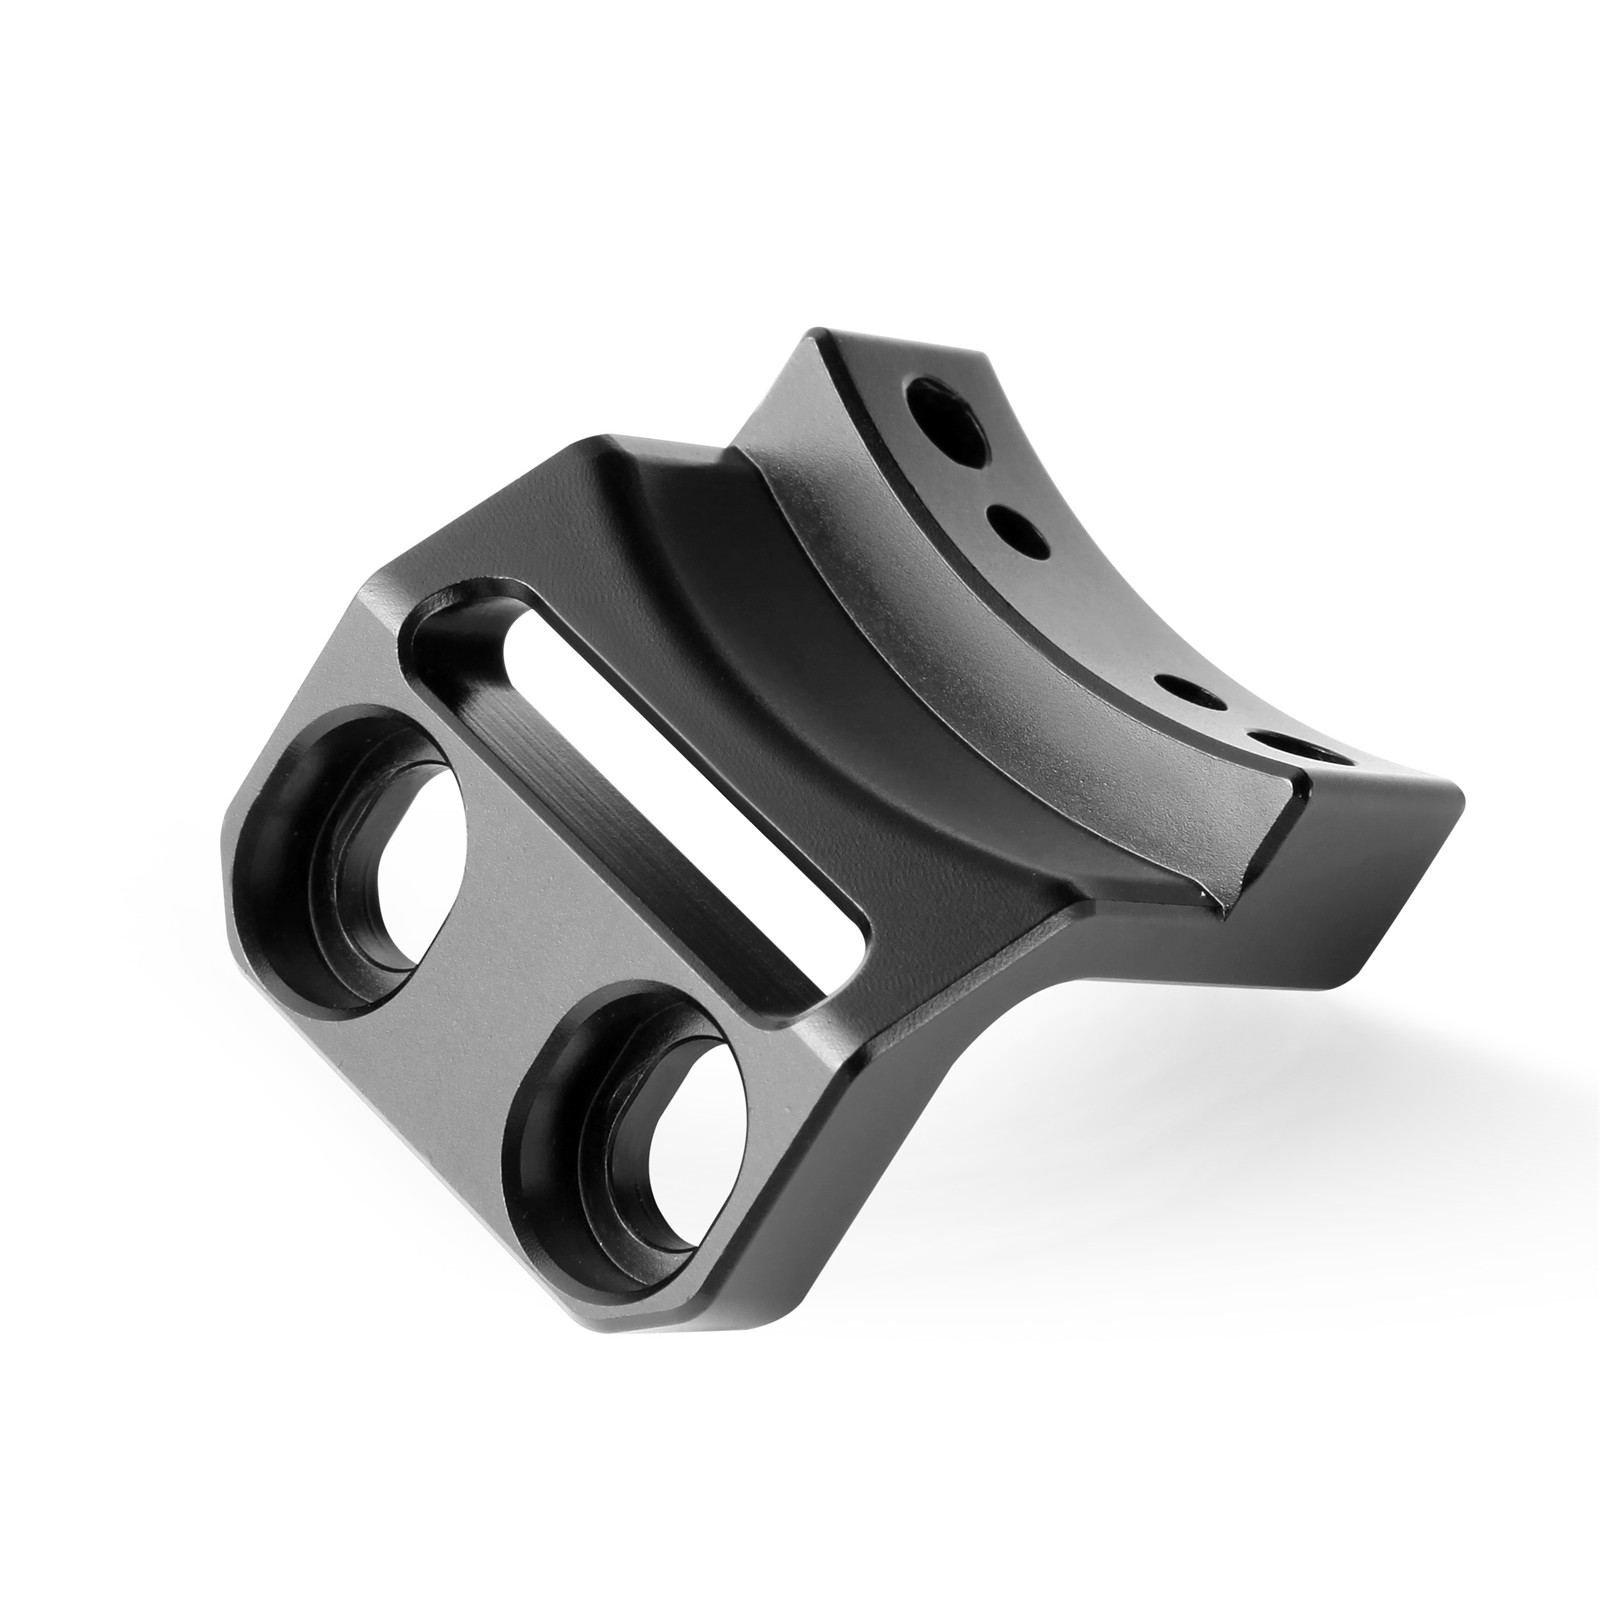 SMALLRIG GH5 Lens Adapter Support Bracket for Lens Mount Converter Support and Stabilization Camera Rig - 2073